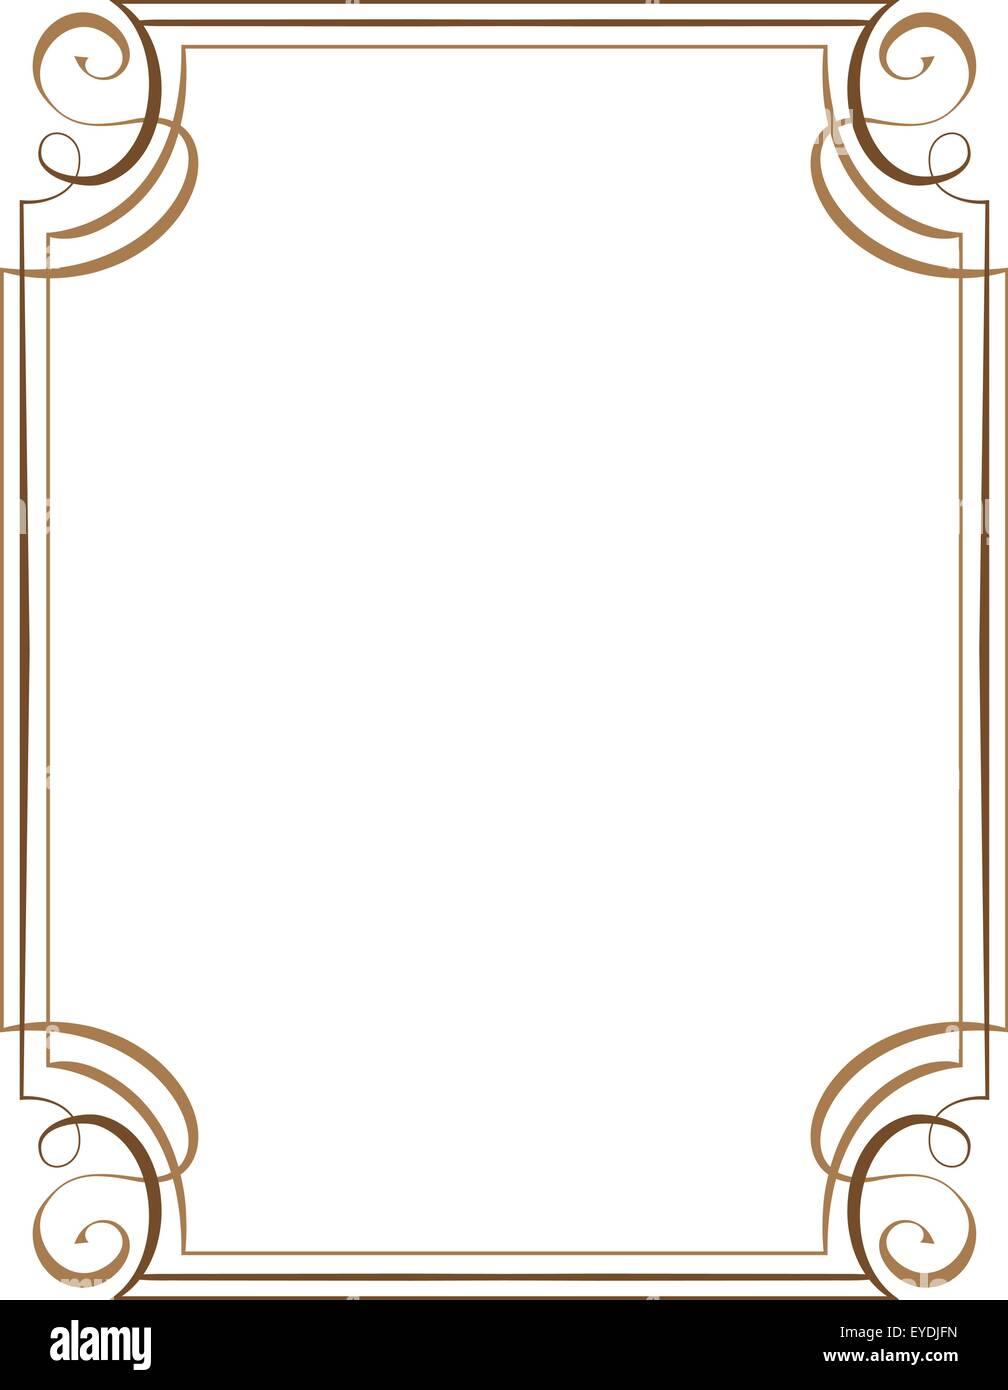 vector vertical frame. Element for graphic design Stock Vector Art ...